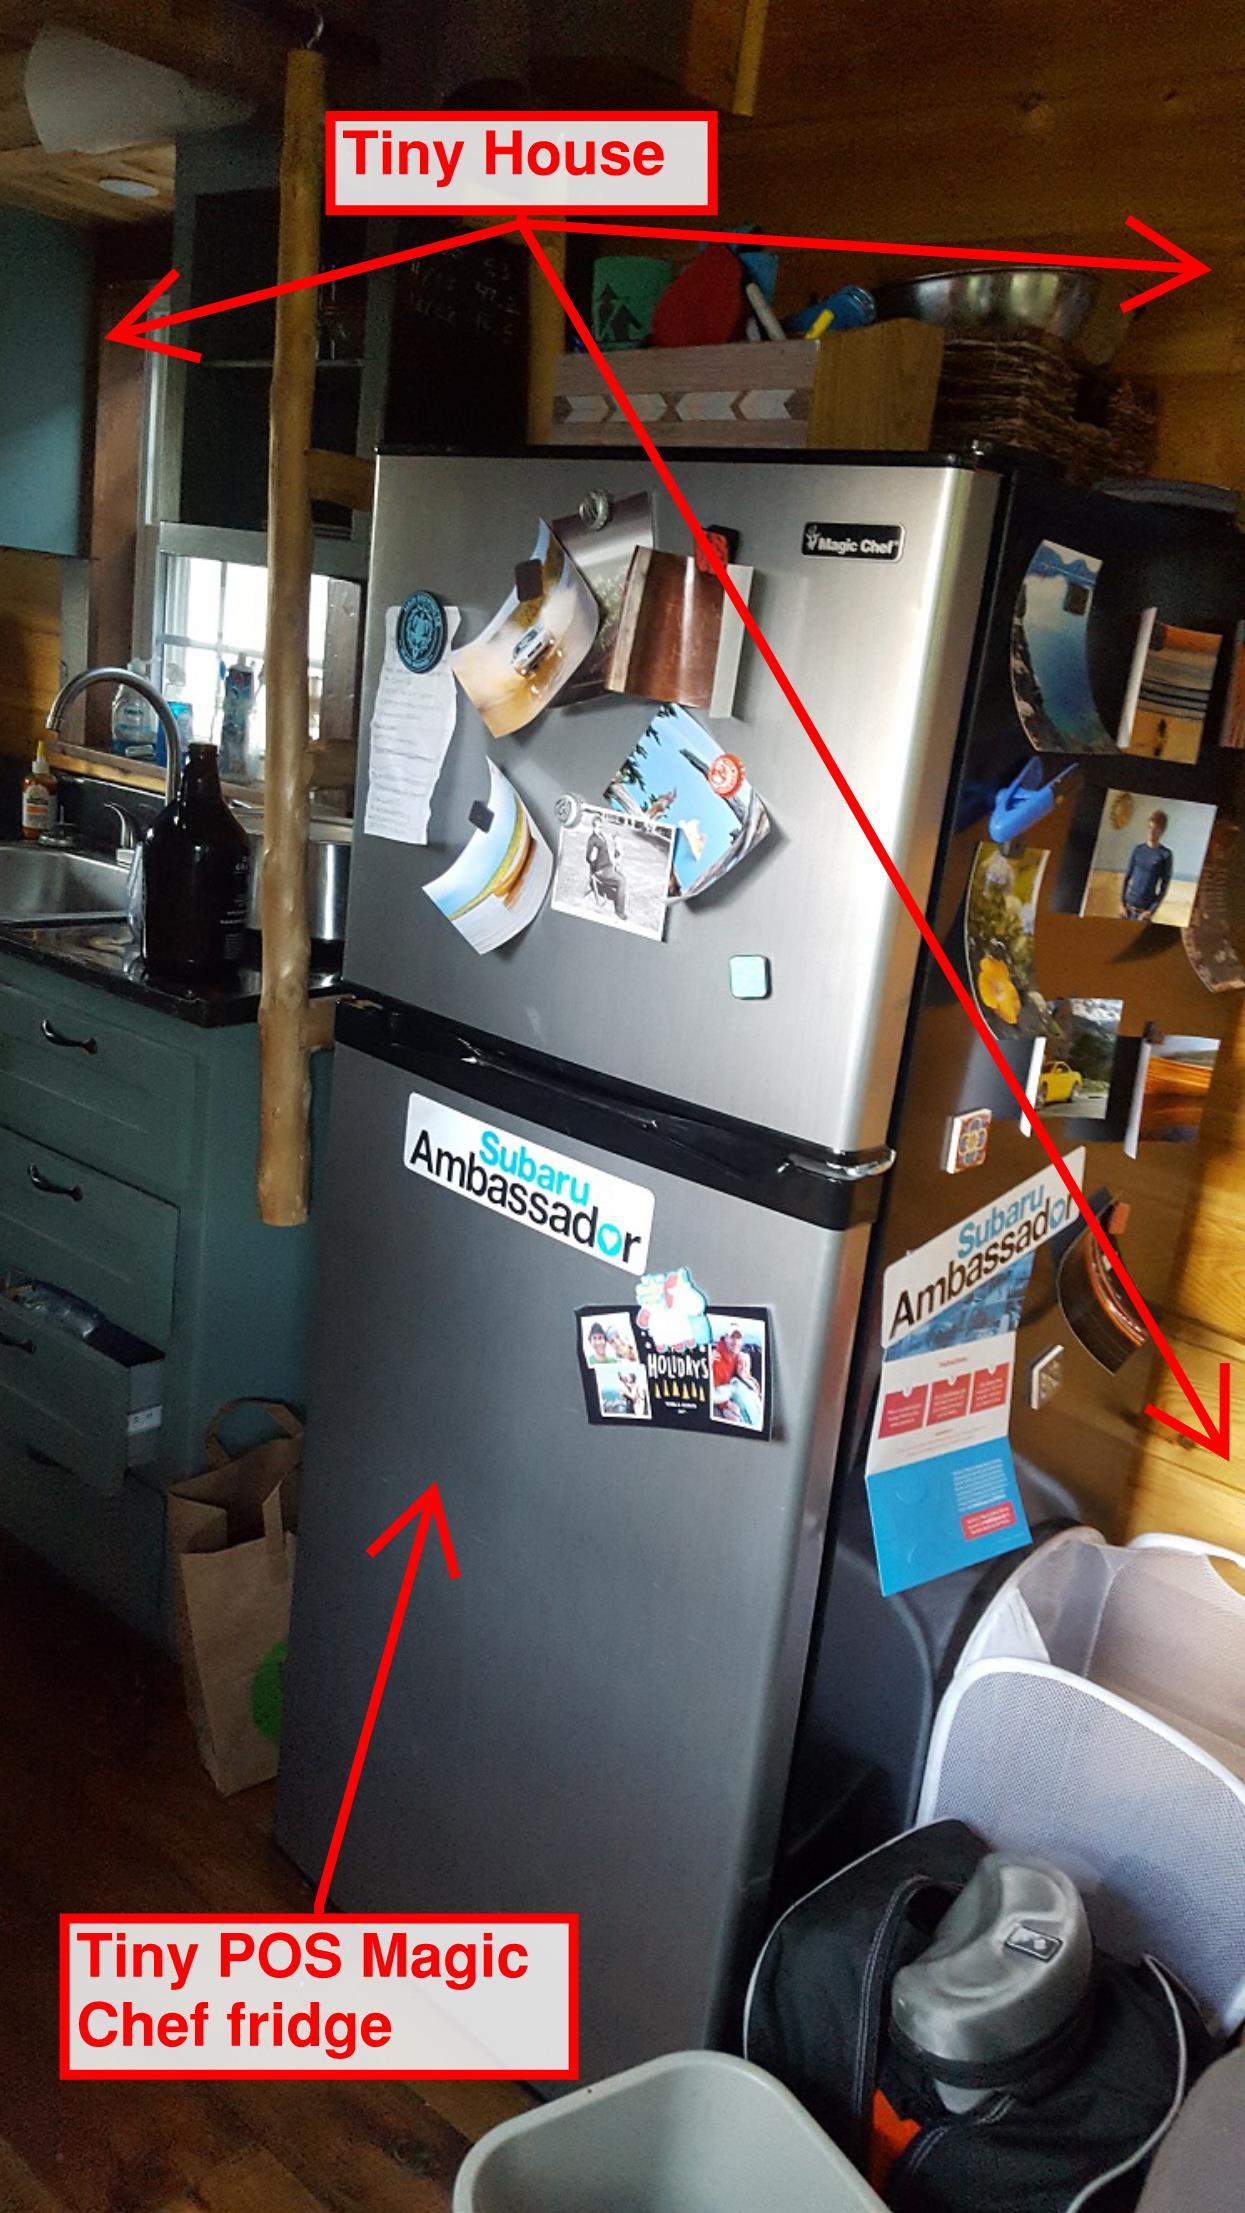 Magic Chef HVDR1040 9.9 CU FT Fridge Repair on magic chef small fridge, older whirlpool refrigerator schematic, magic chef wall oven parts, frigidaire ice maker schematic,